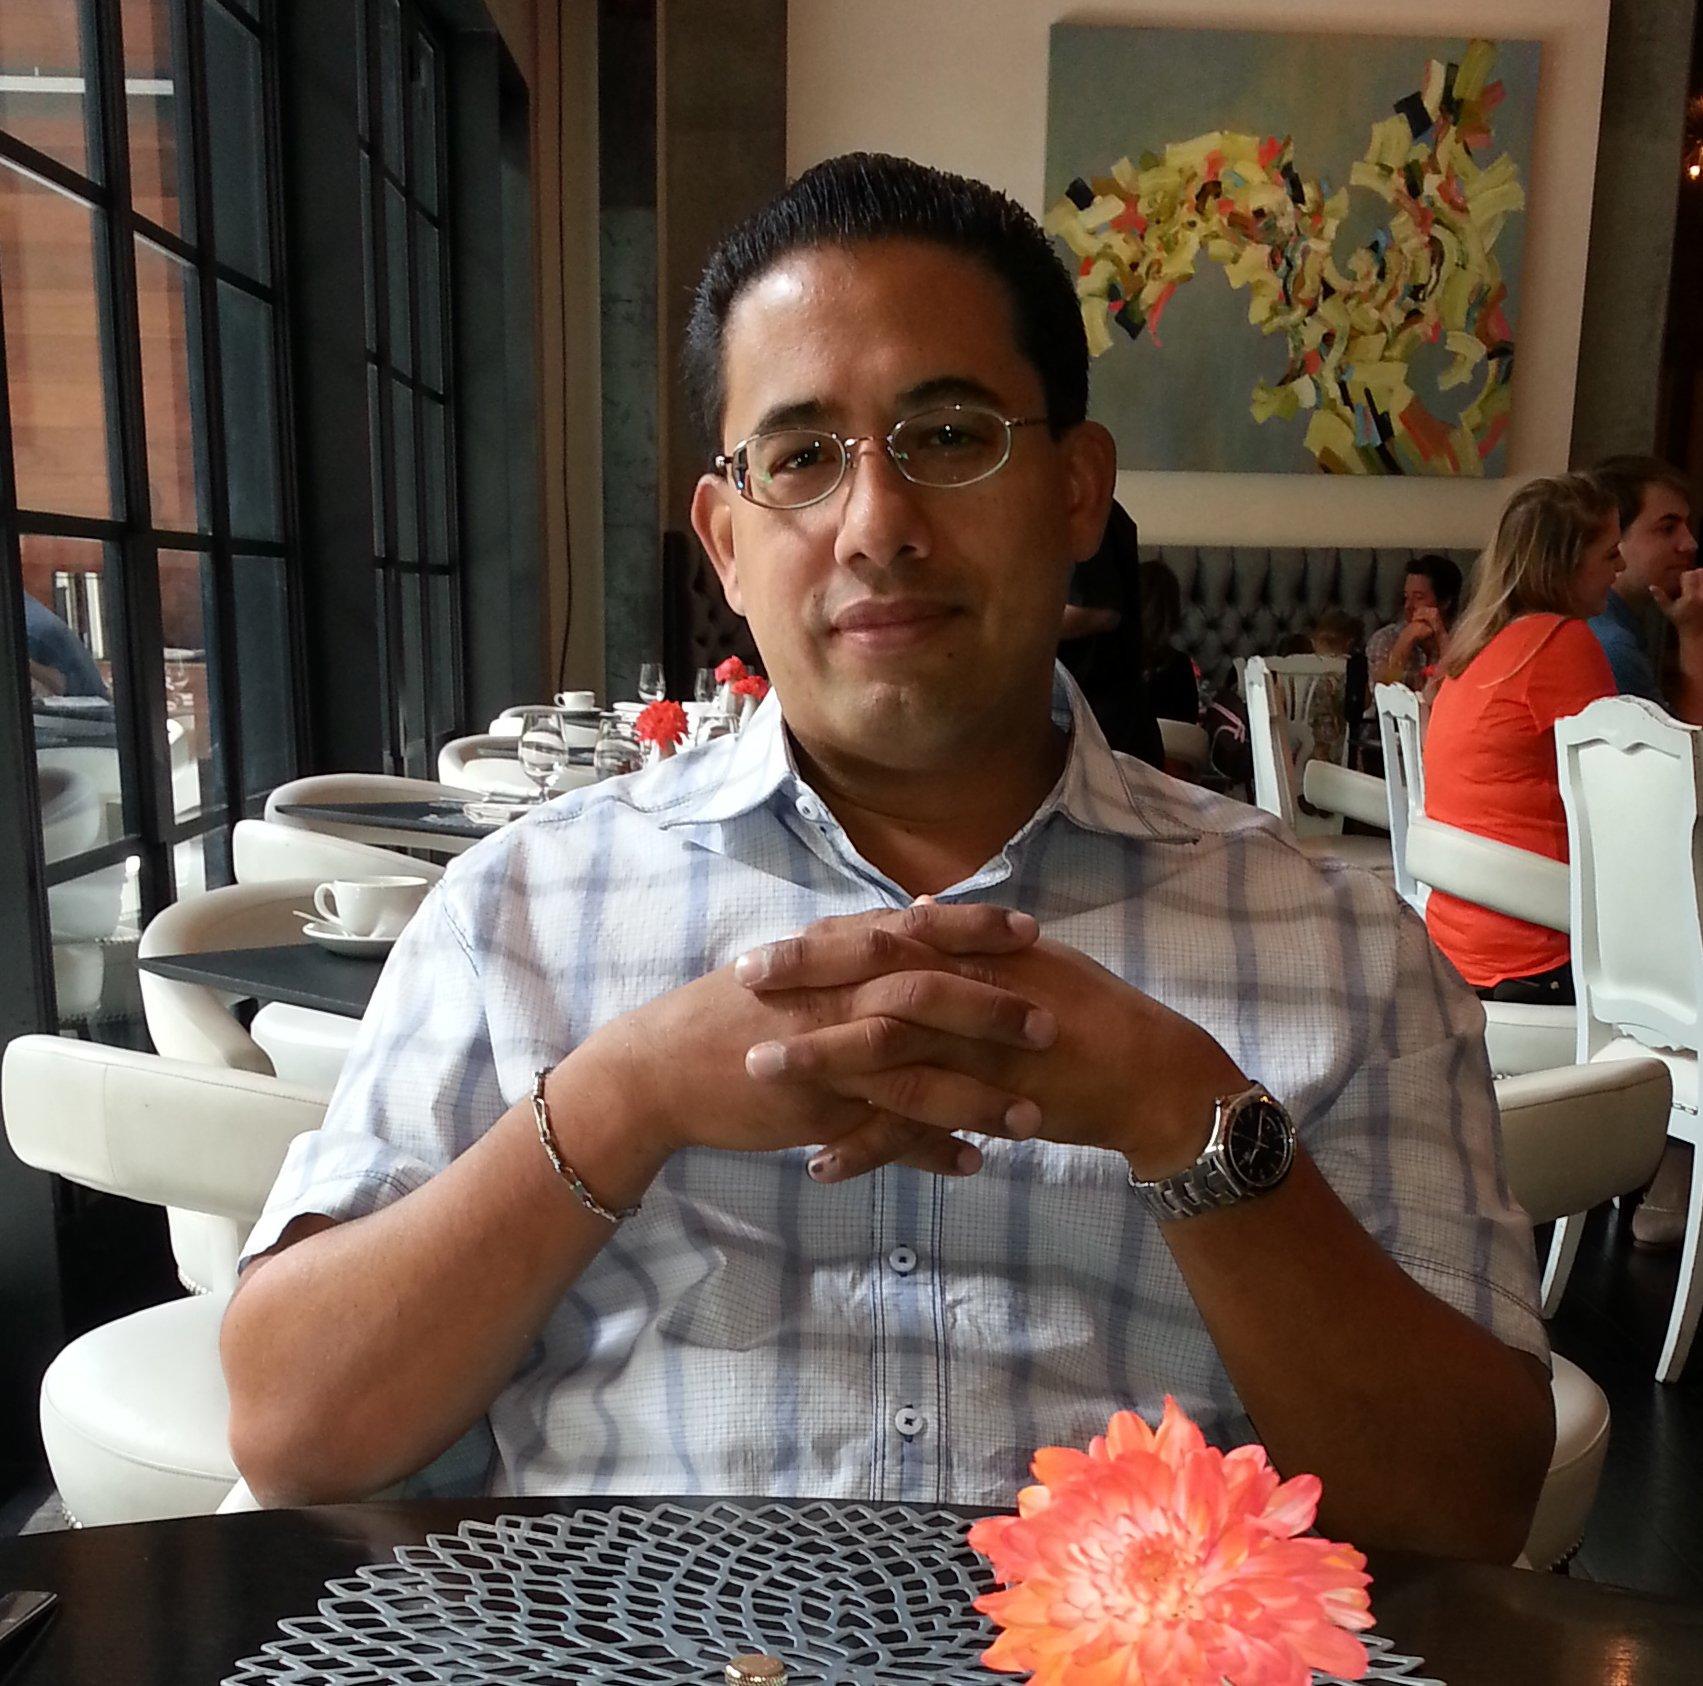 Carlos Castaneda of CJ's Roofing in San Antonio, TX